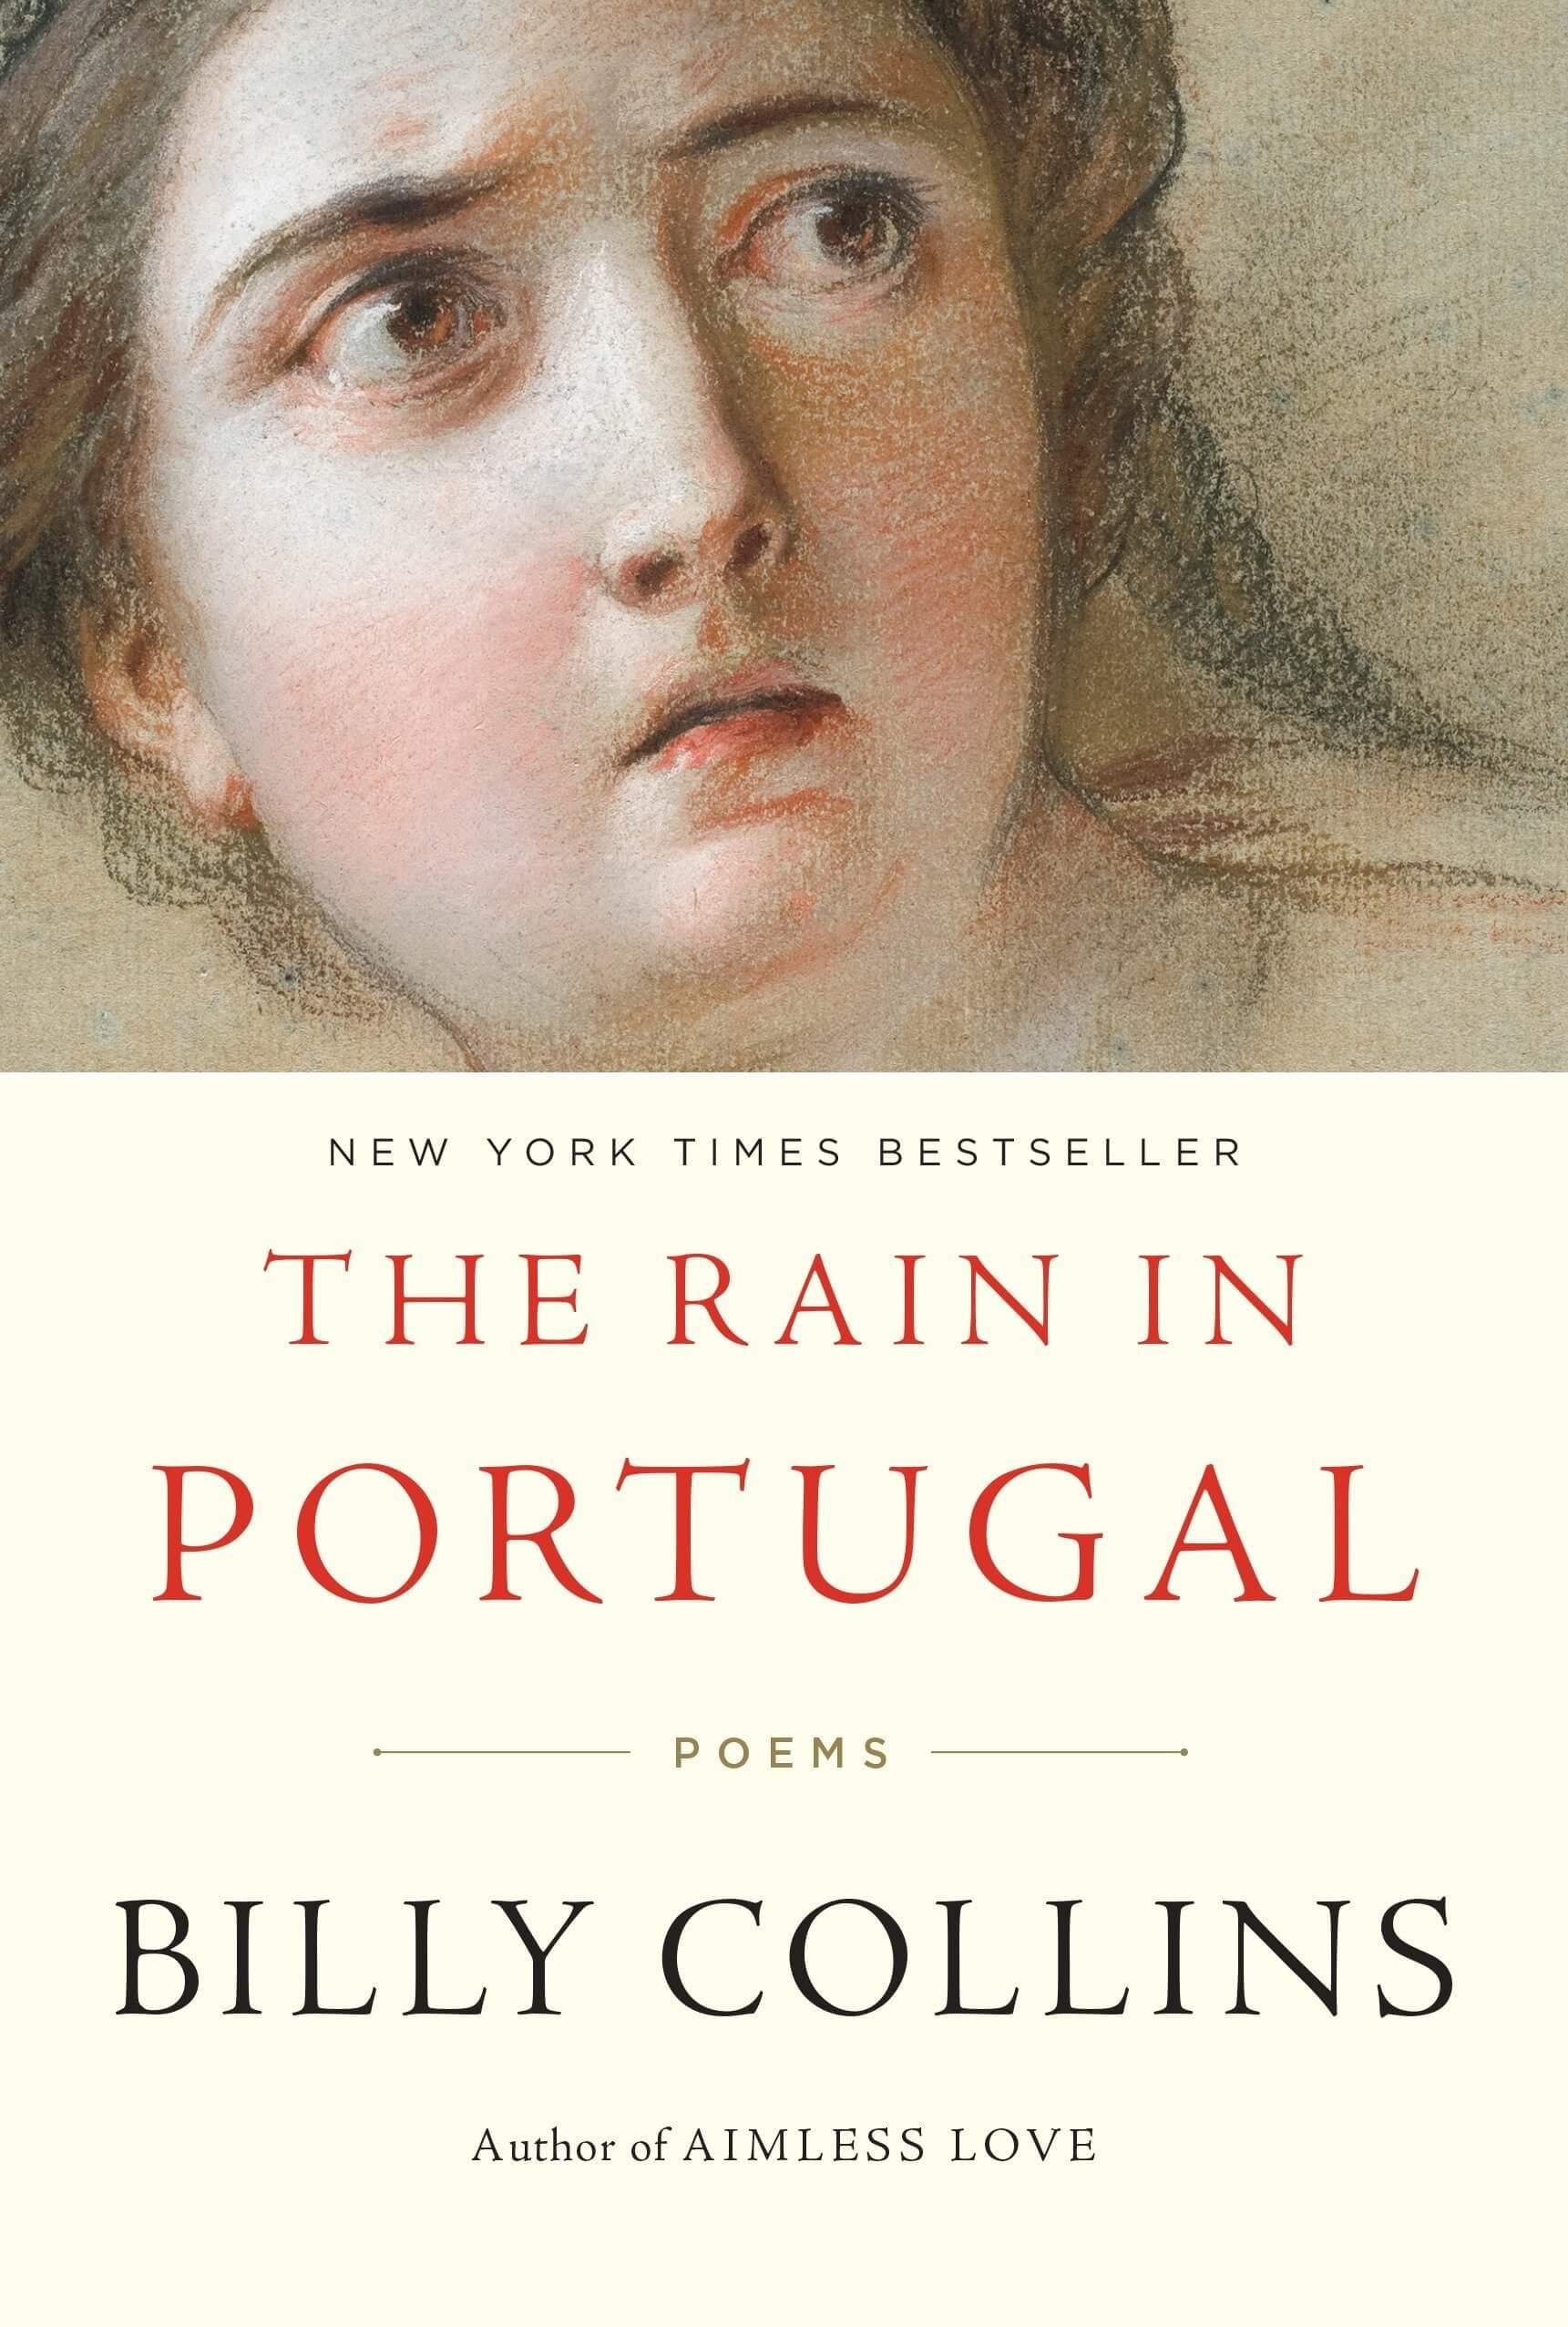 The Rain in Portugal book cover image